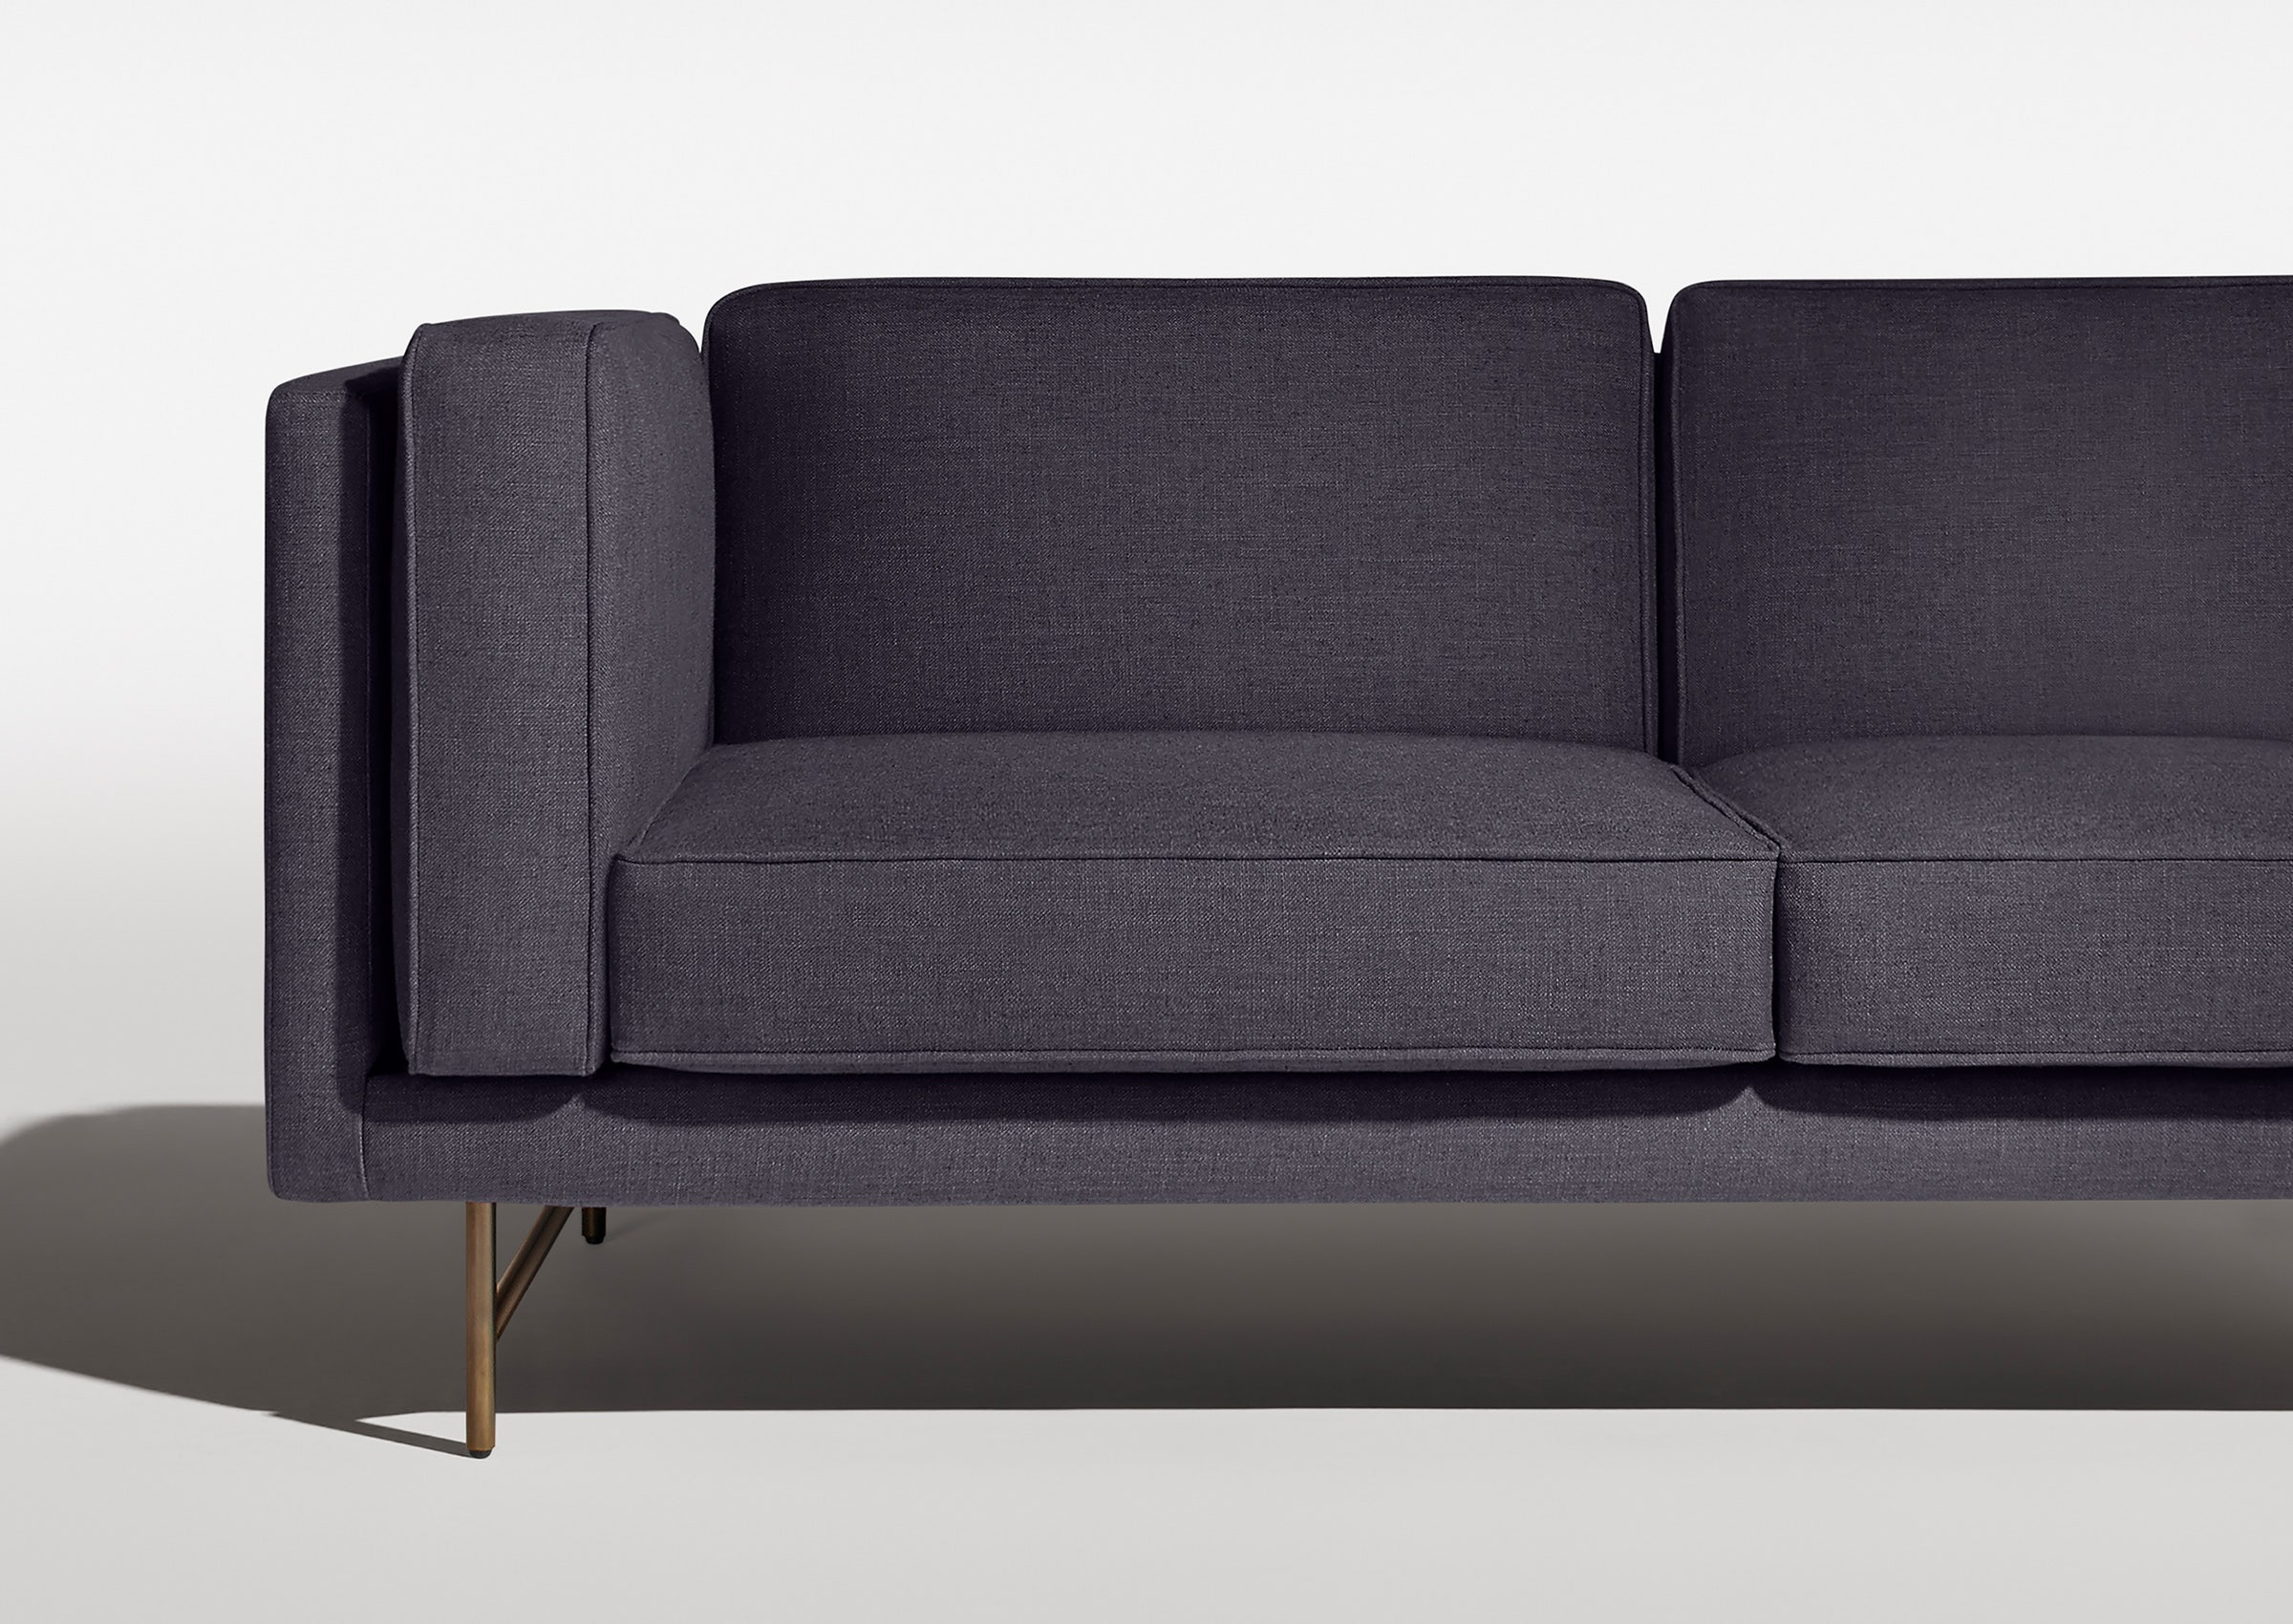 blue dot sofa – Home and Textiles